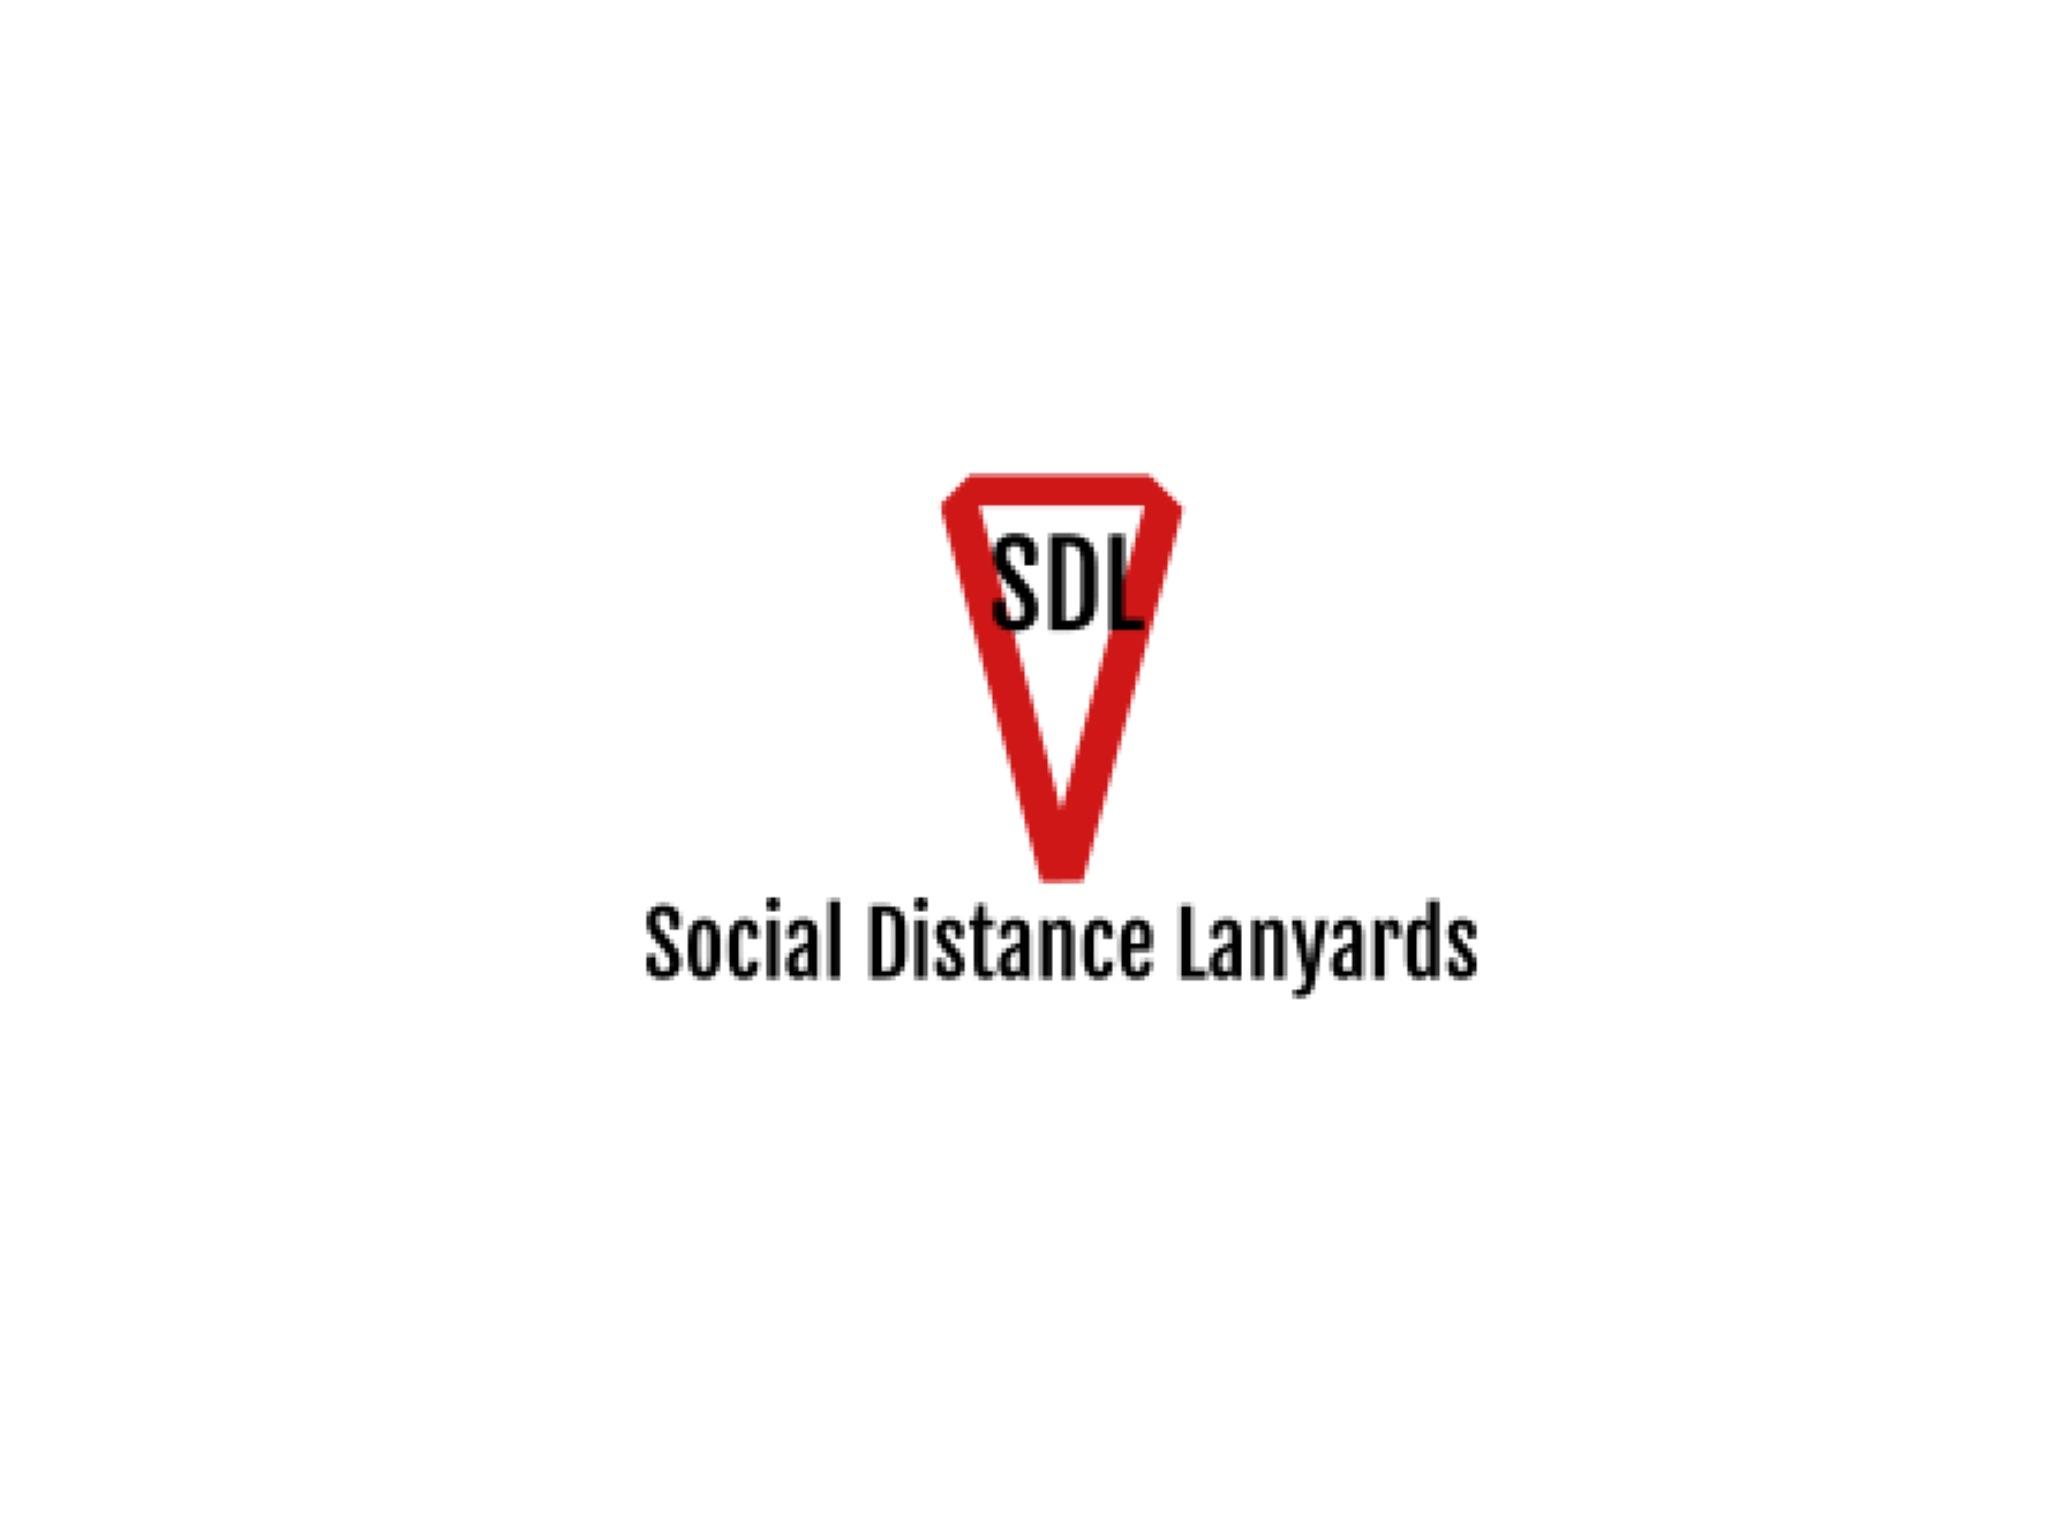 SDL - Social Distance Lanyards 's logo